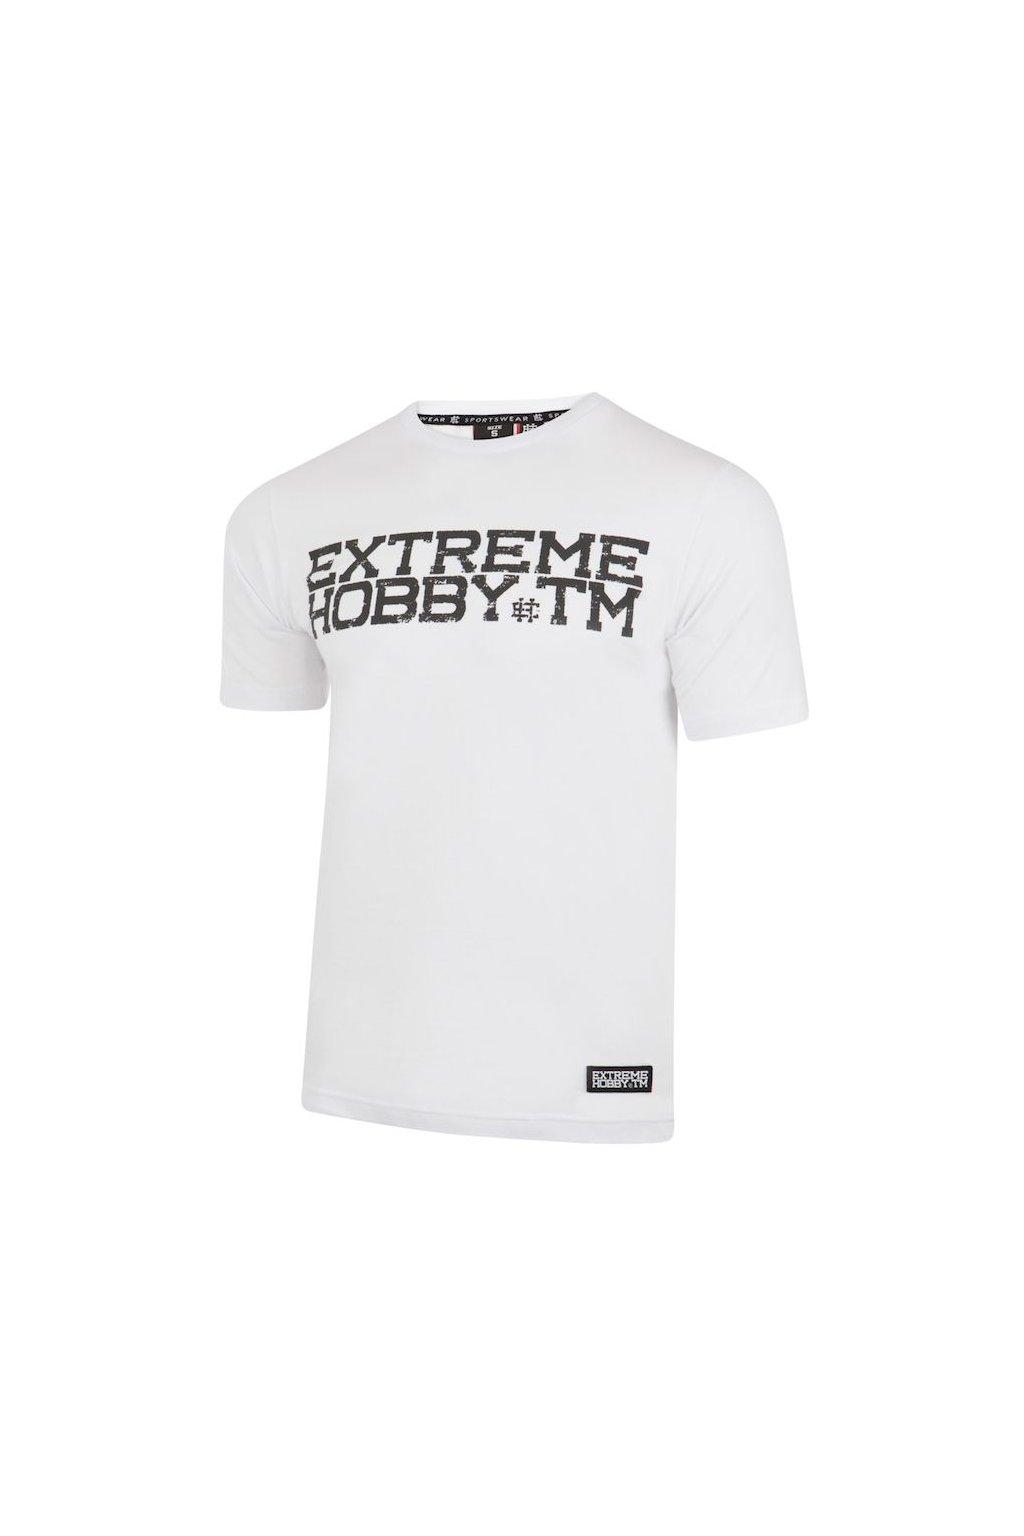 Pánské triko EXTREME HOBBY Brushed Block bílá obr1